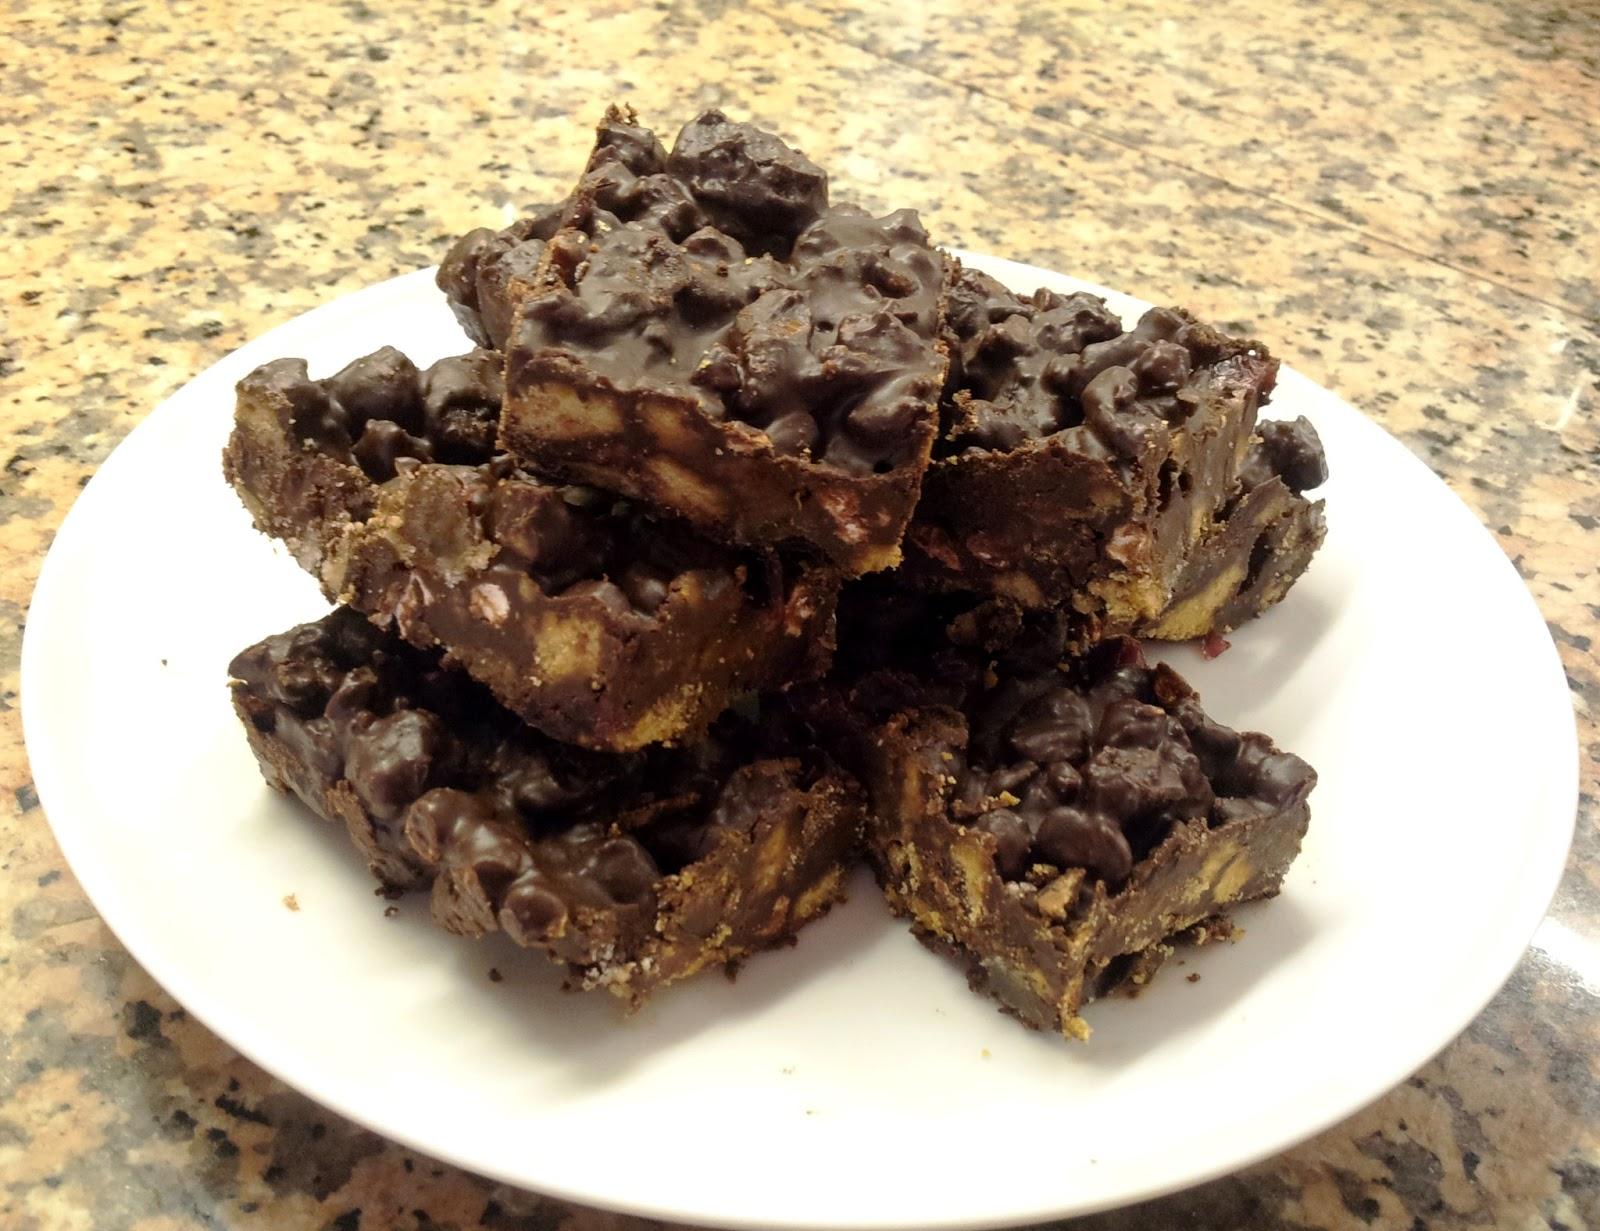 Chocolate Tiffin (Refrigerator Cake) Recipe